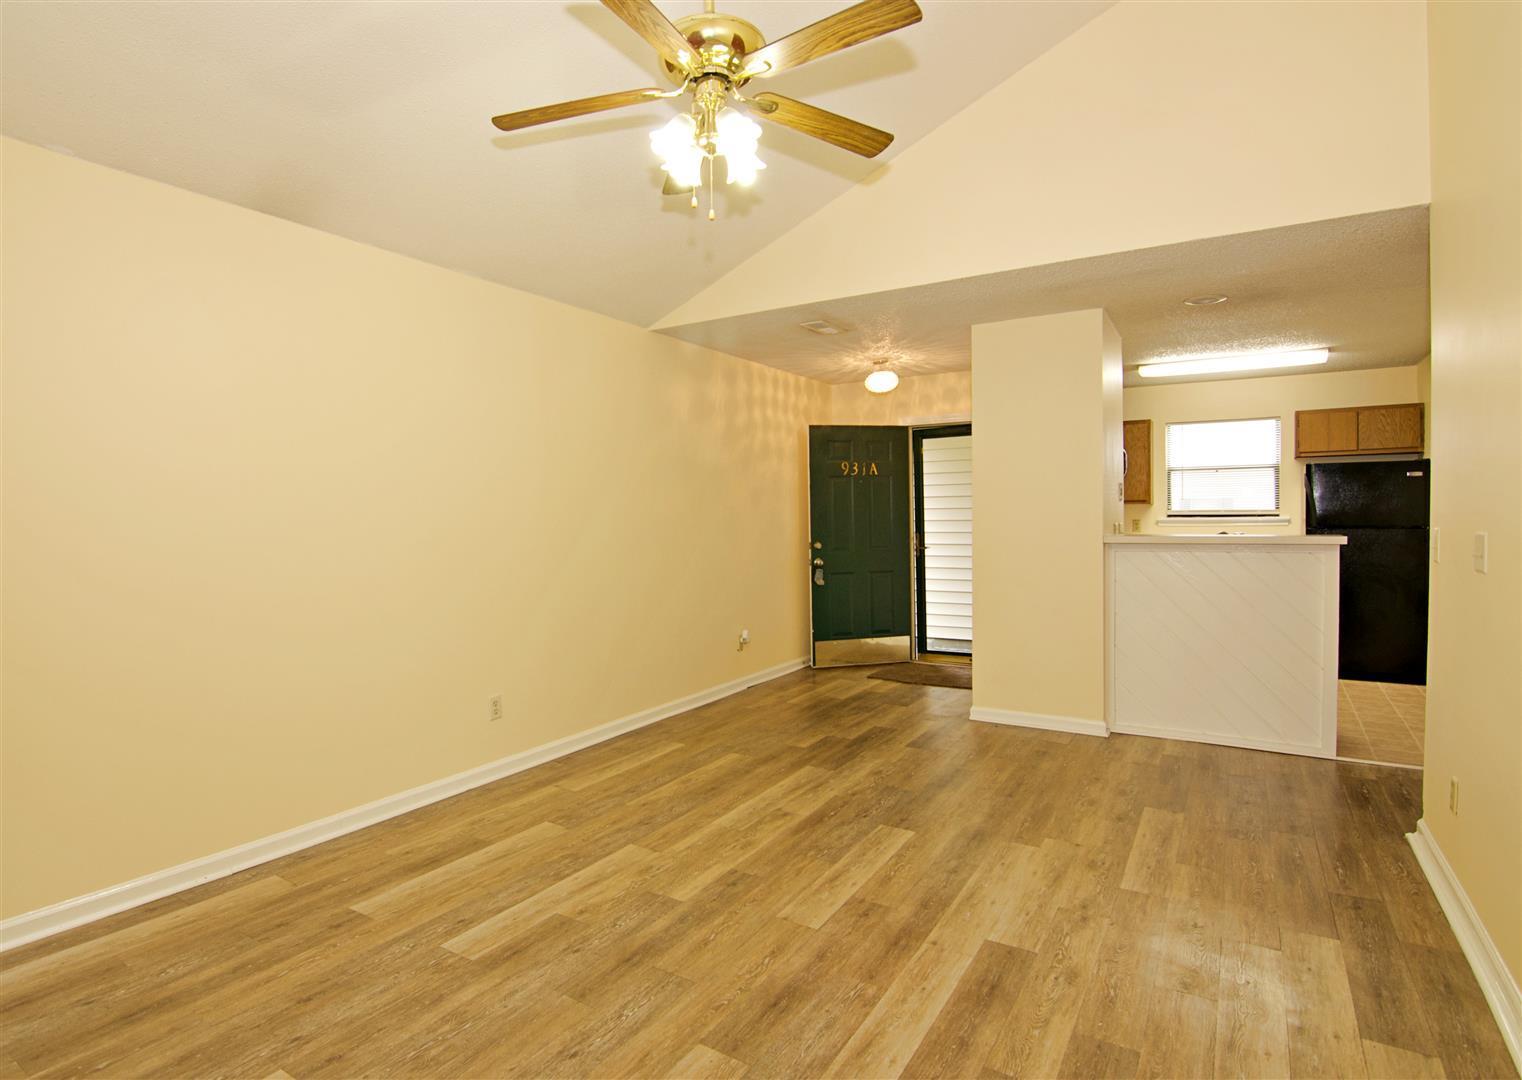 Shaftesbury Woods Homes For Sale - 931 Estates, Charleston, SC - 19